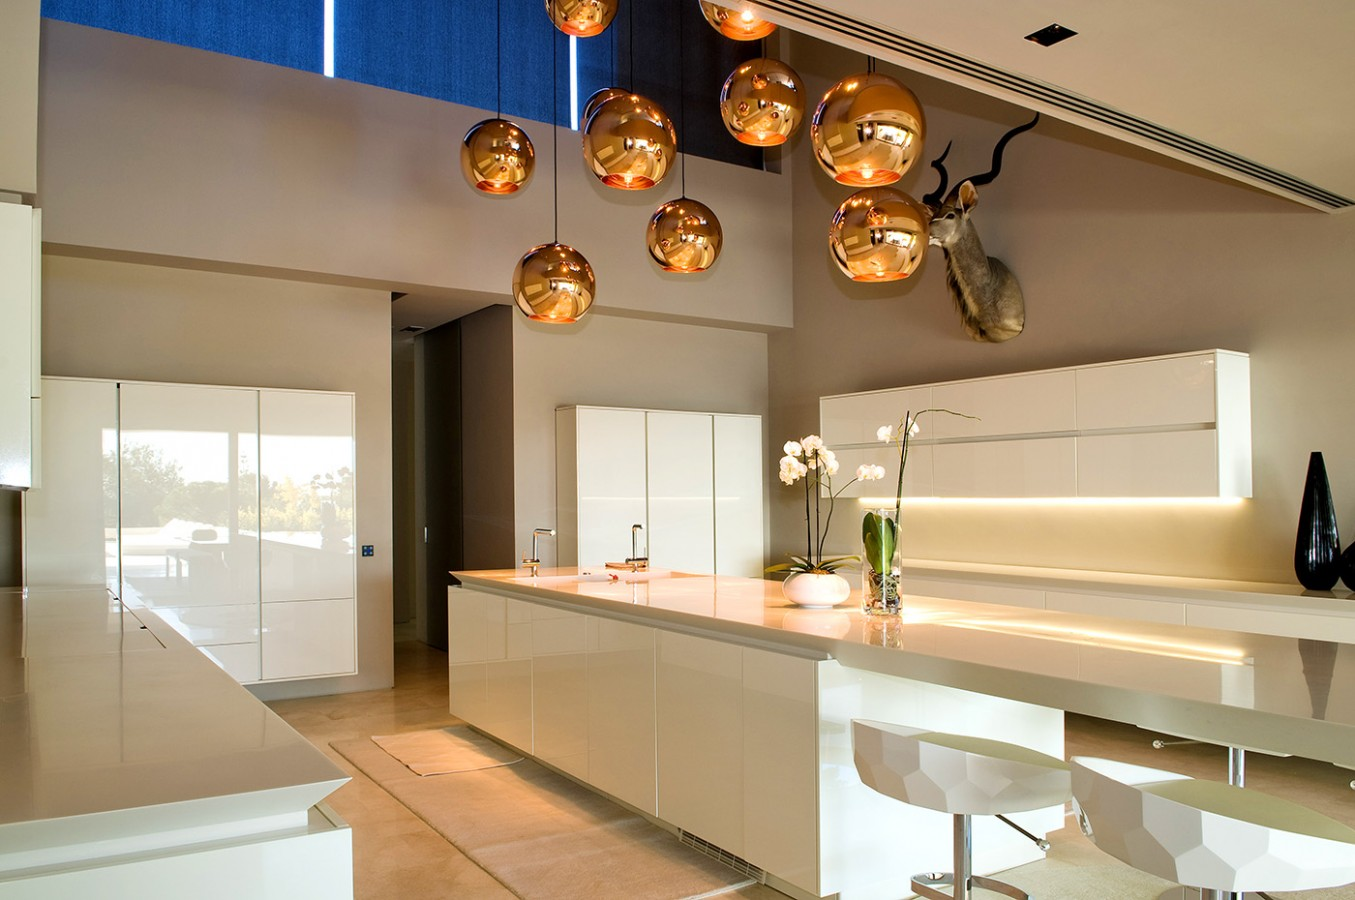 Marbella II - kitchen